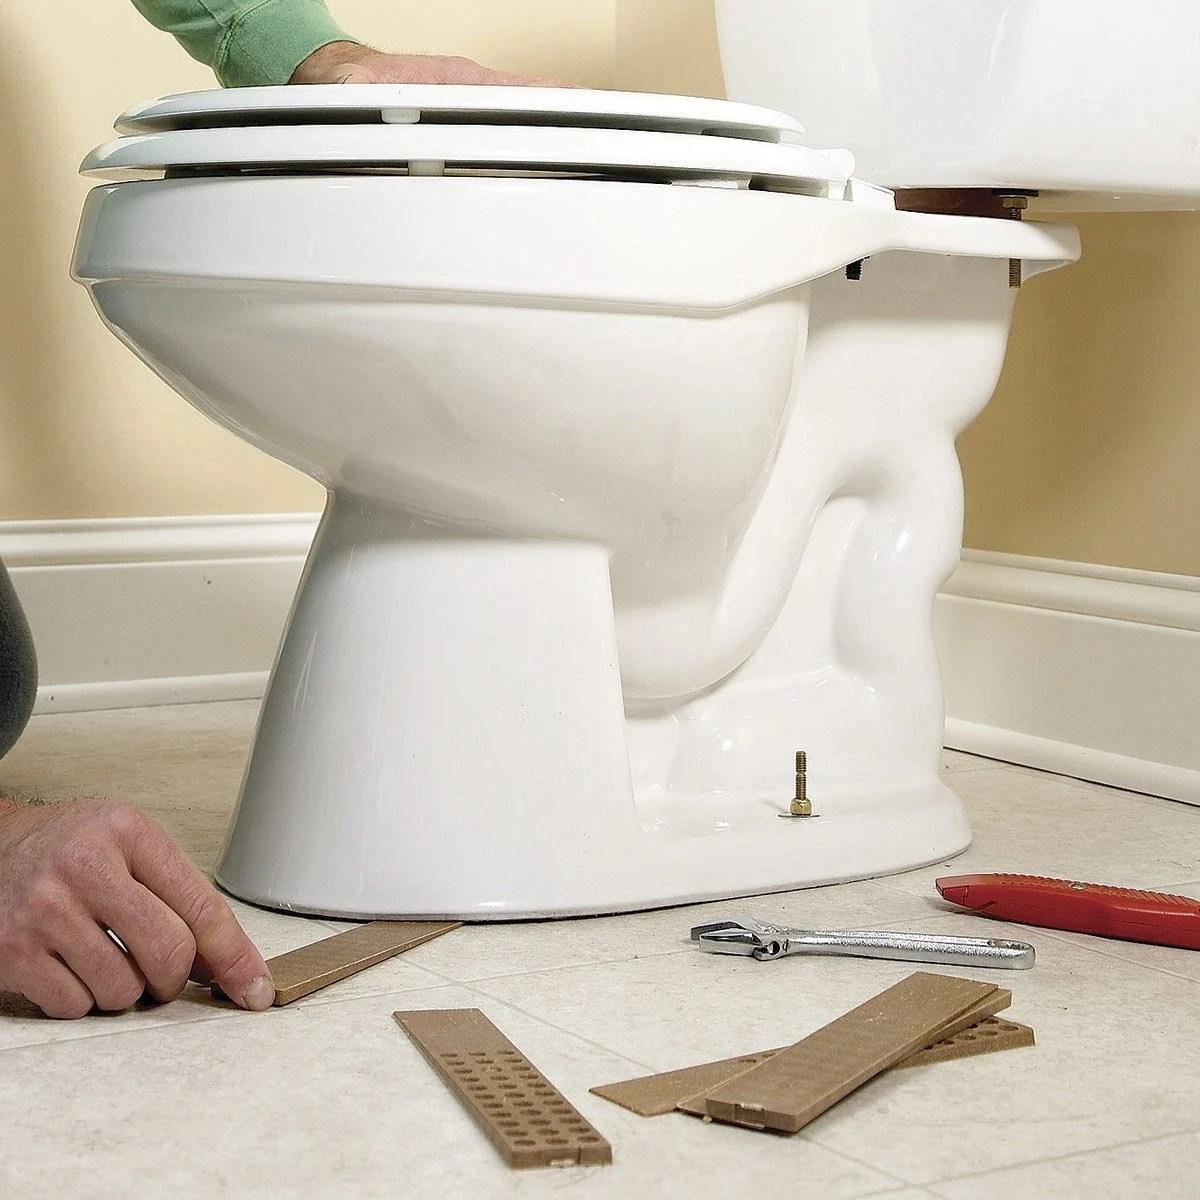 14 Toilet Problems You Ll Regret Ignoring Family Handyman